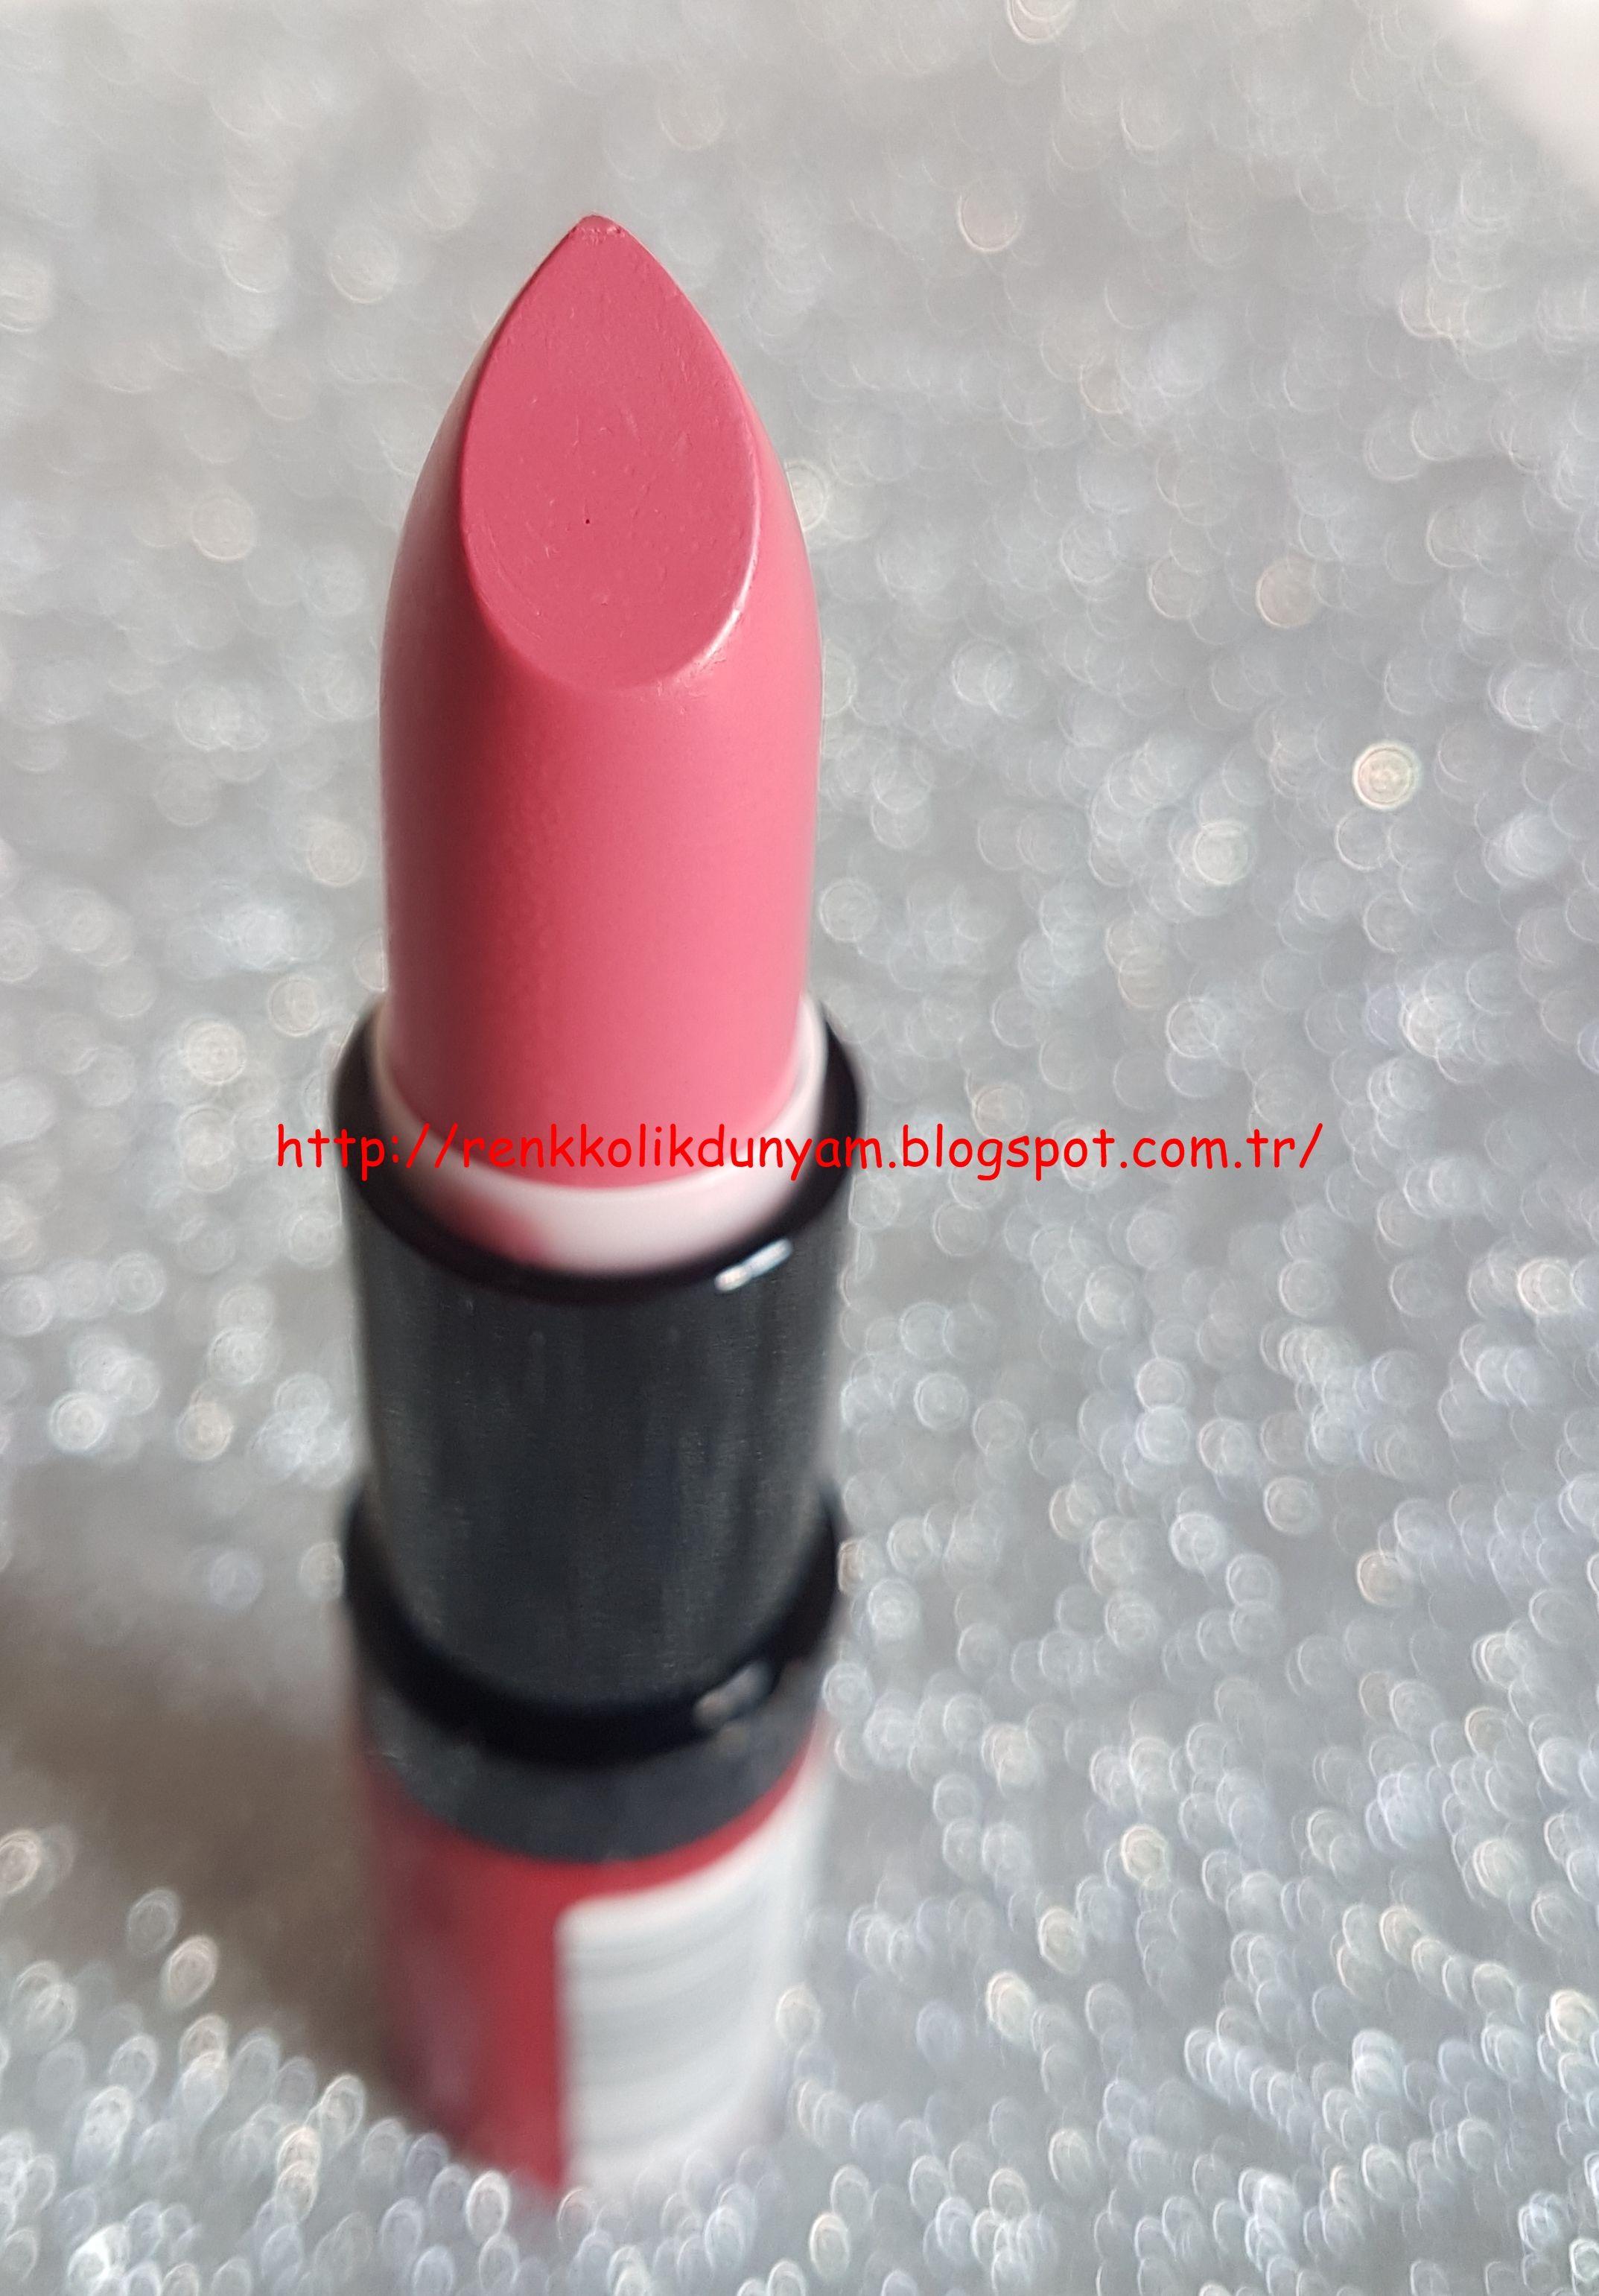 Rimmel Lasting Finish Lipstick by Kate #020 (Chemist